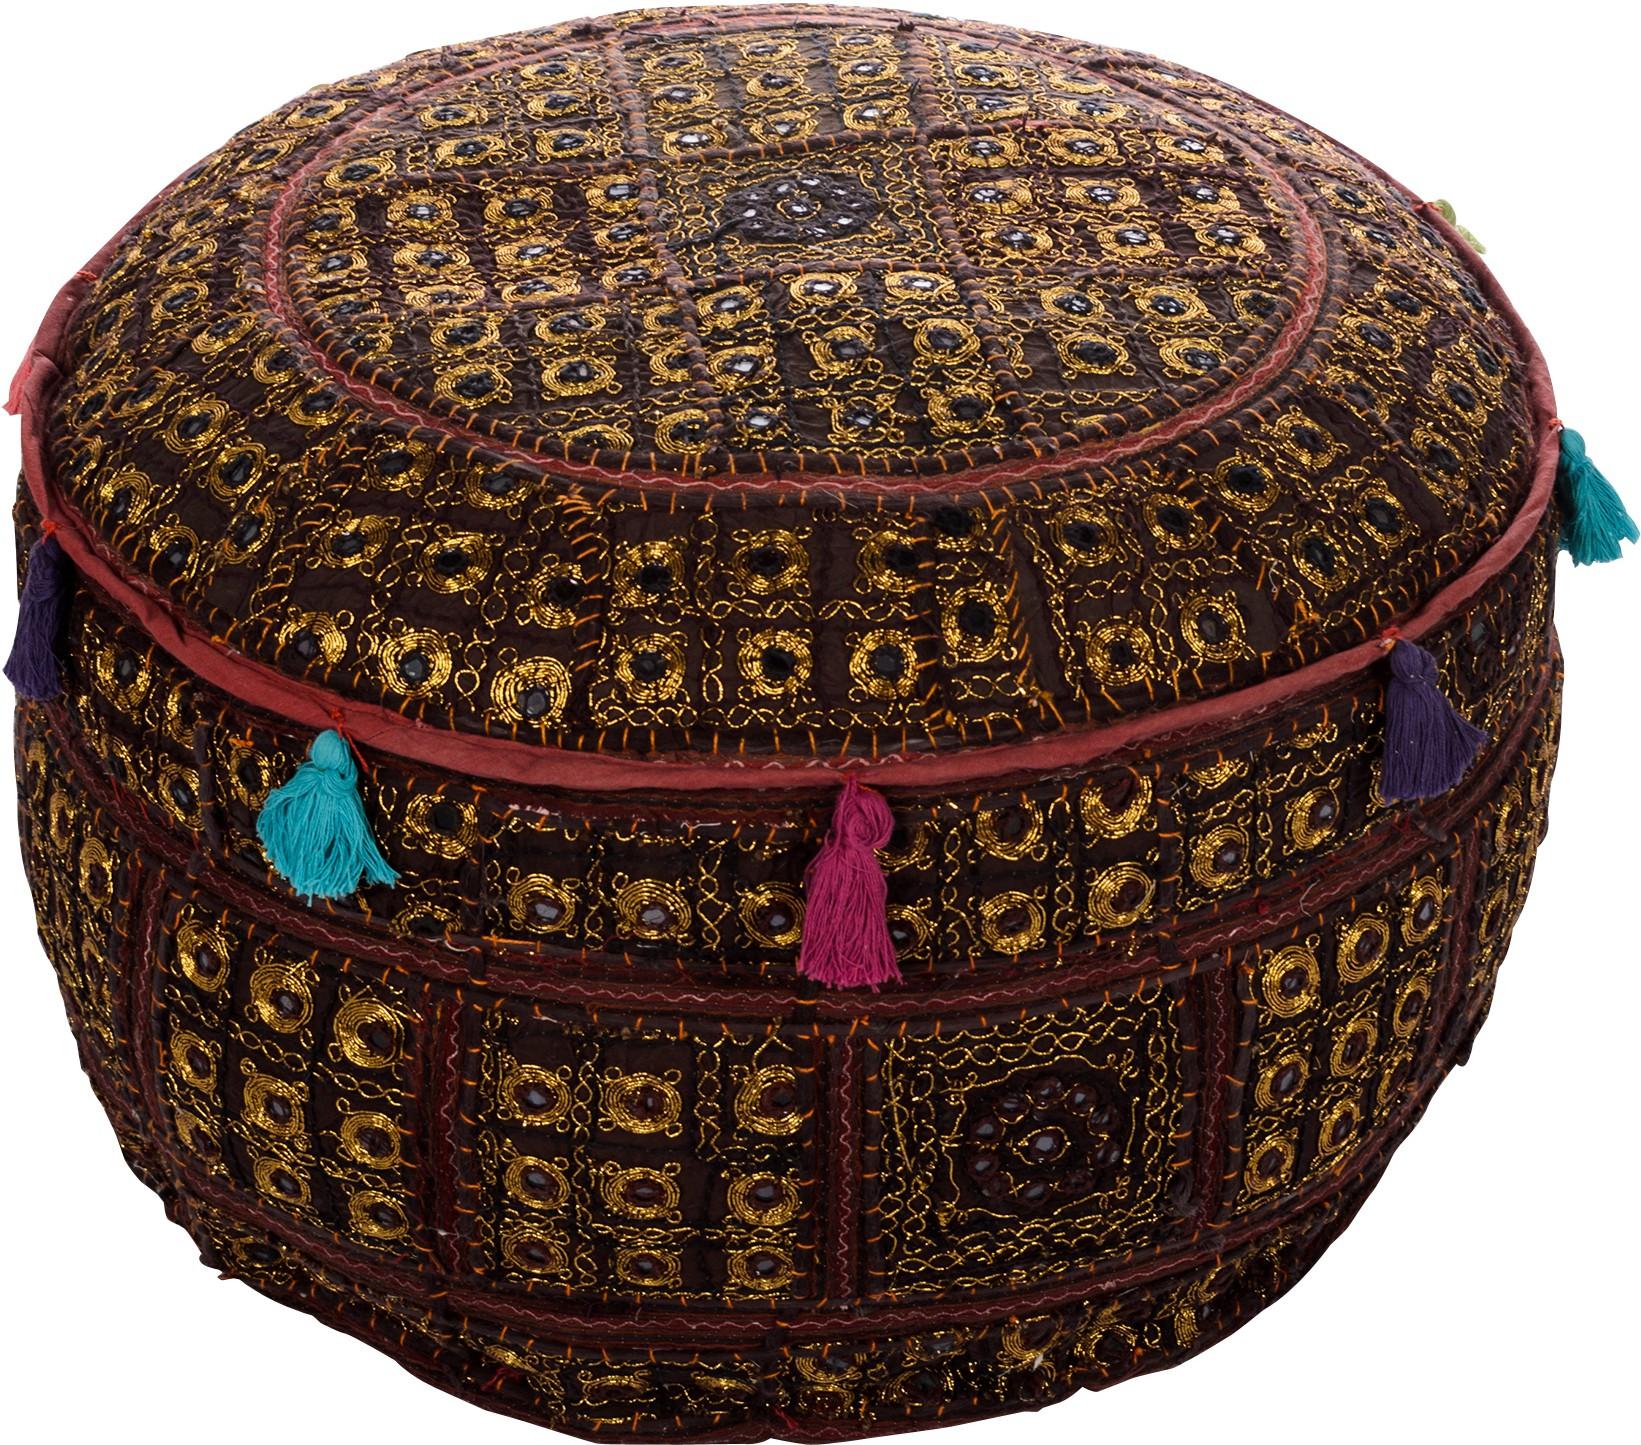 View Artasia Fabric Pouf(Finish Color - Brown) Furniture (Artasia)